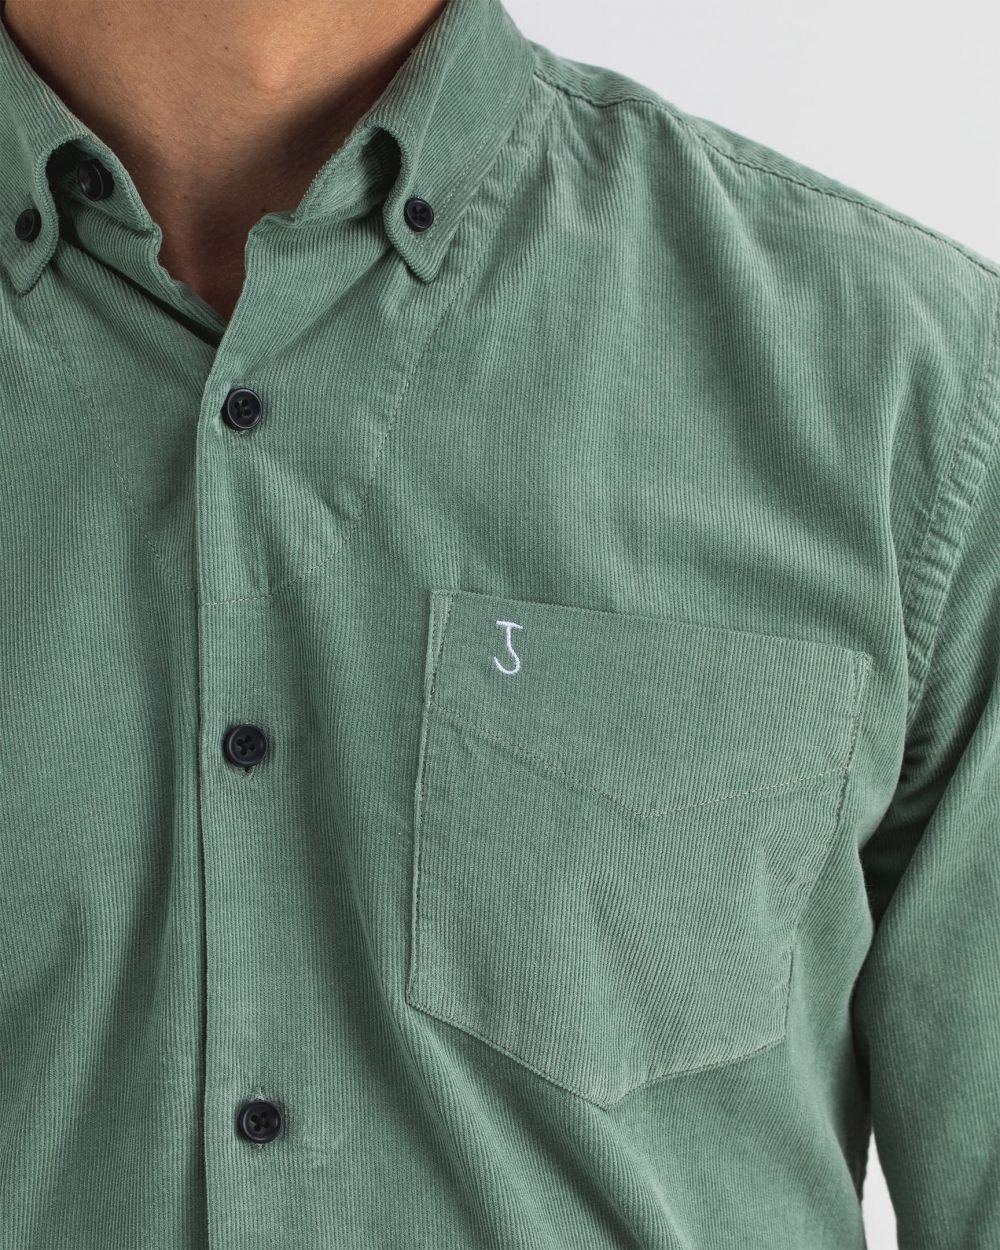 Robbins babycord shirt deplhi green-1